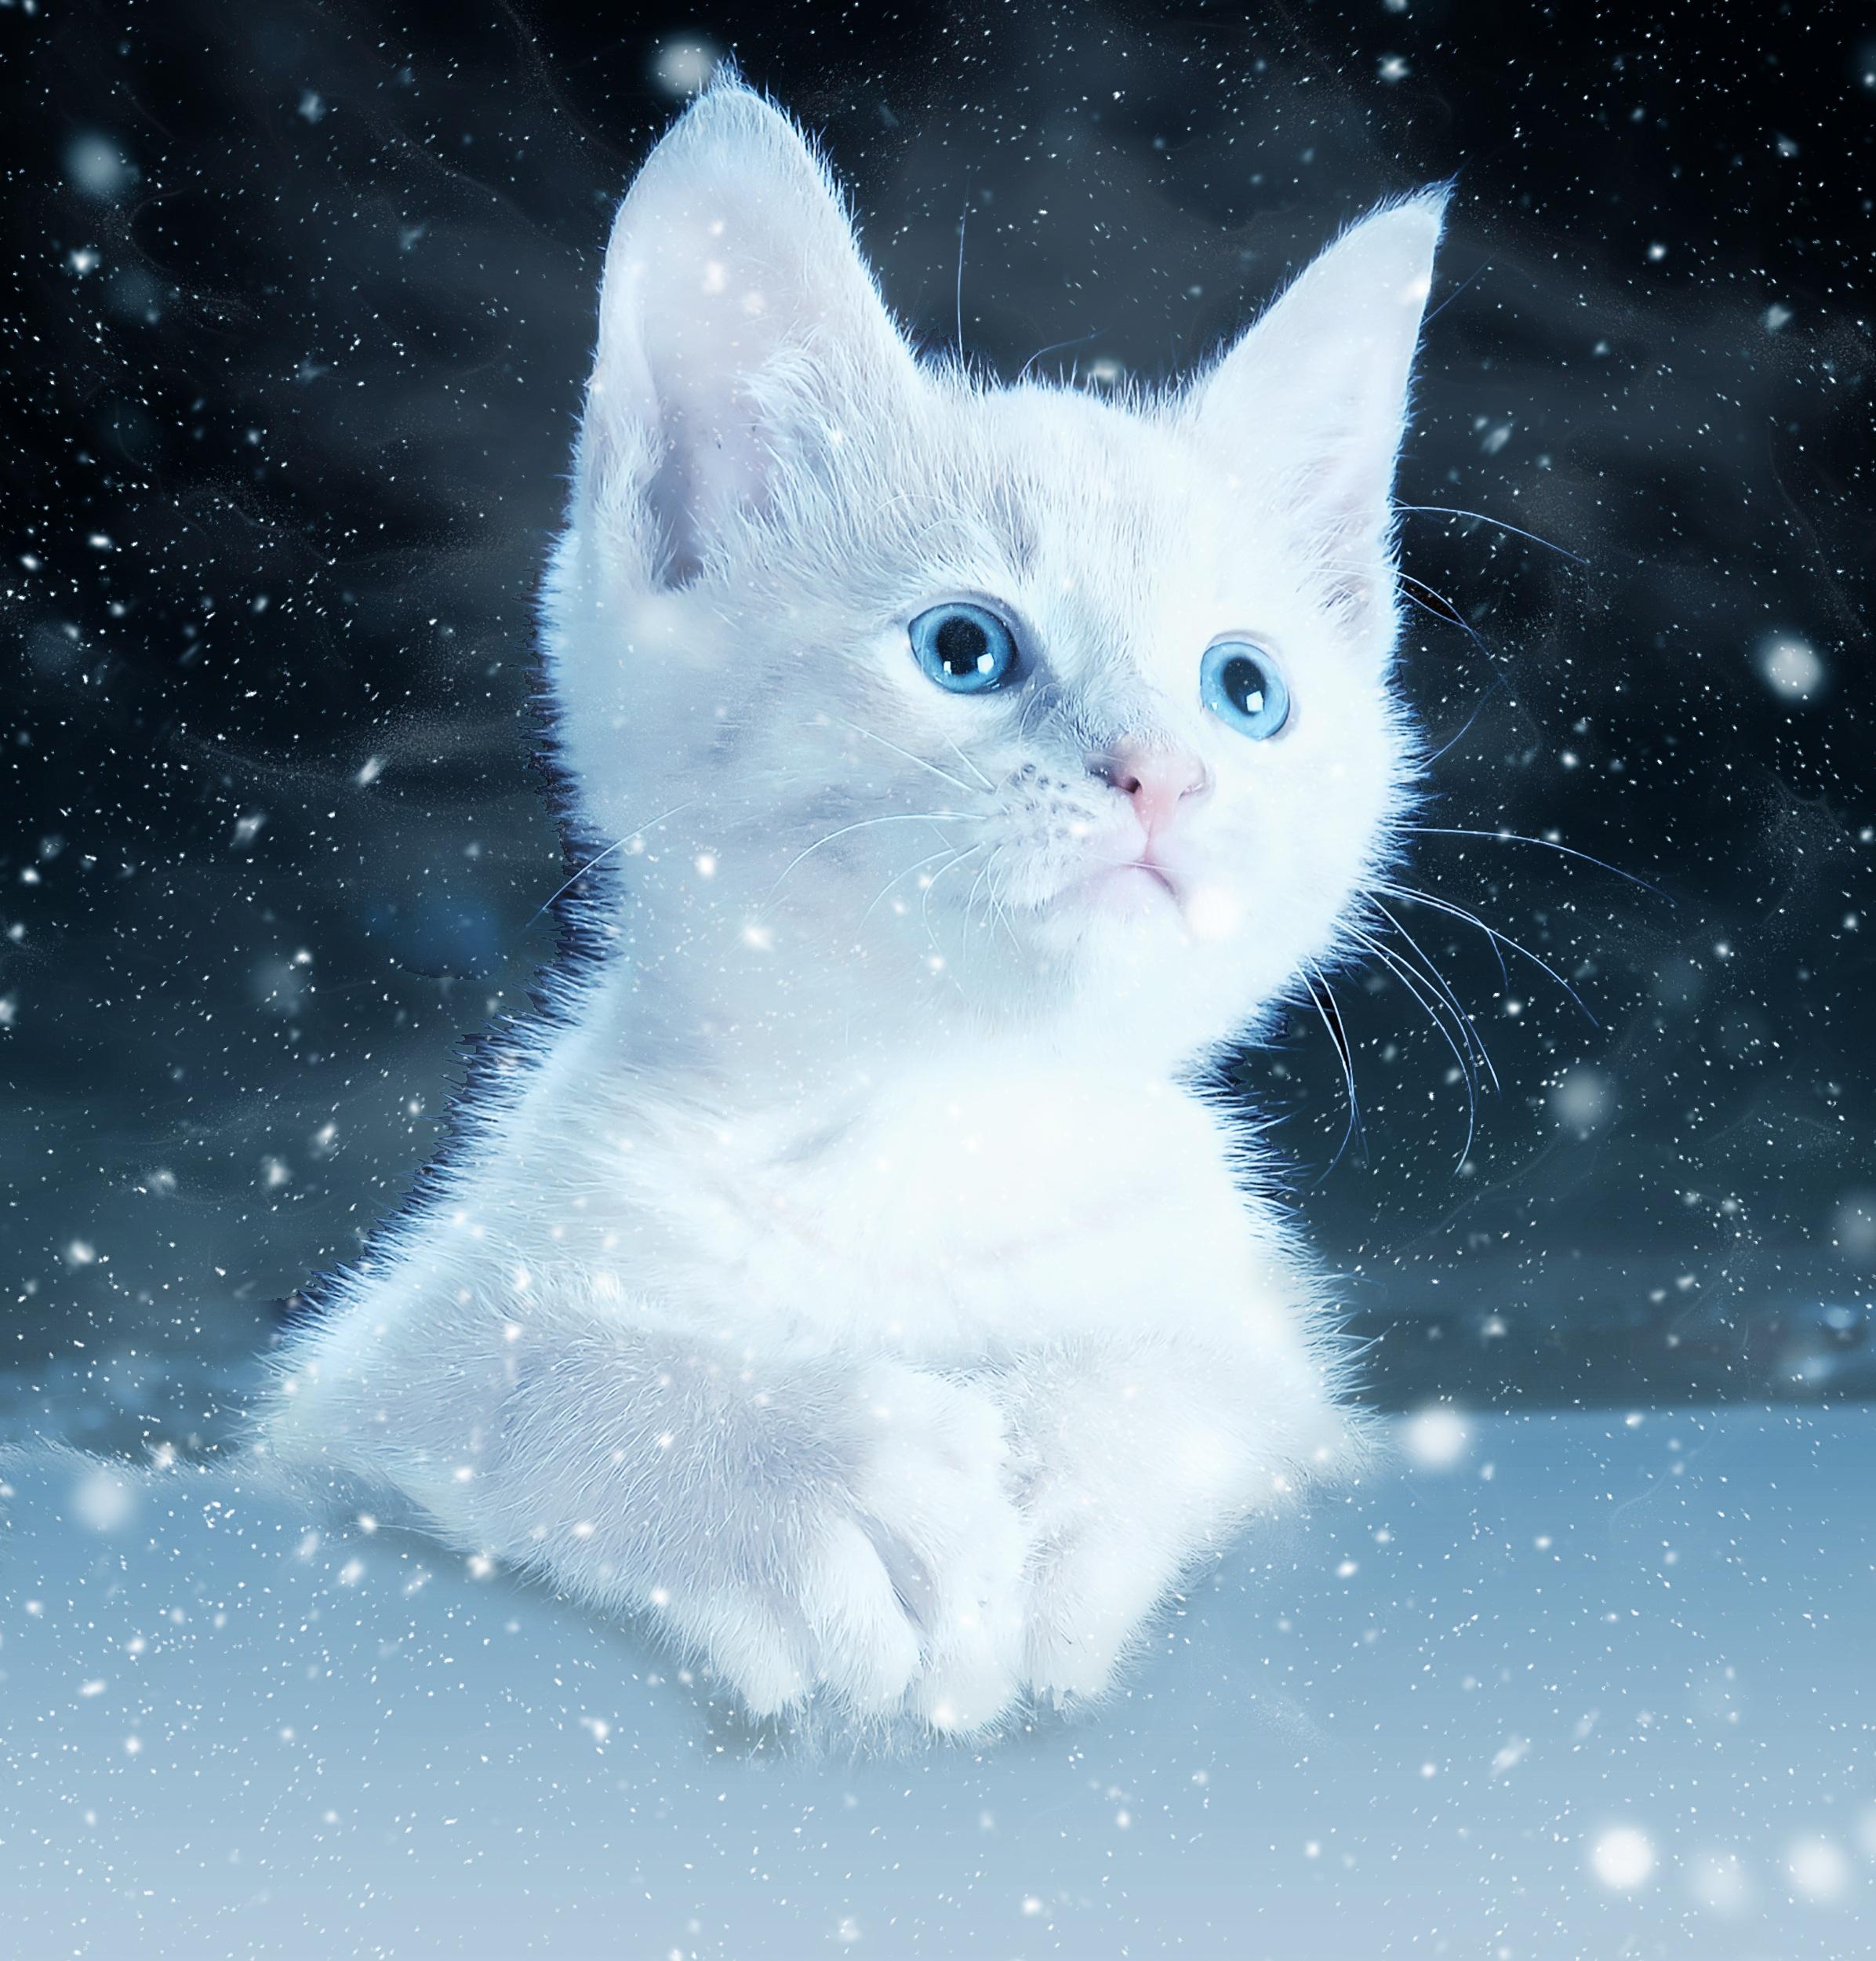 cat-2178155.jpg